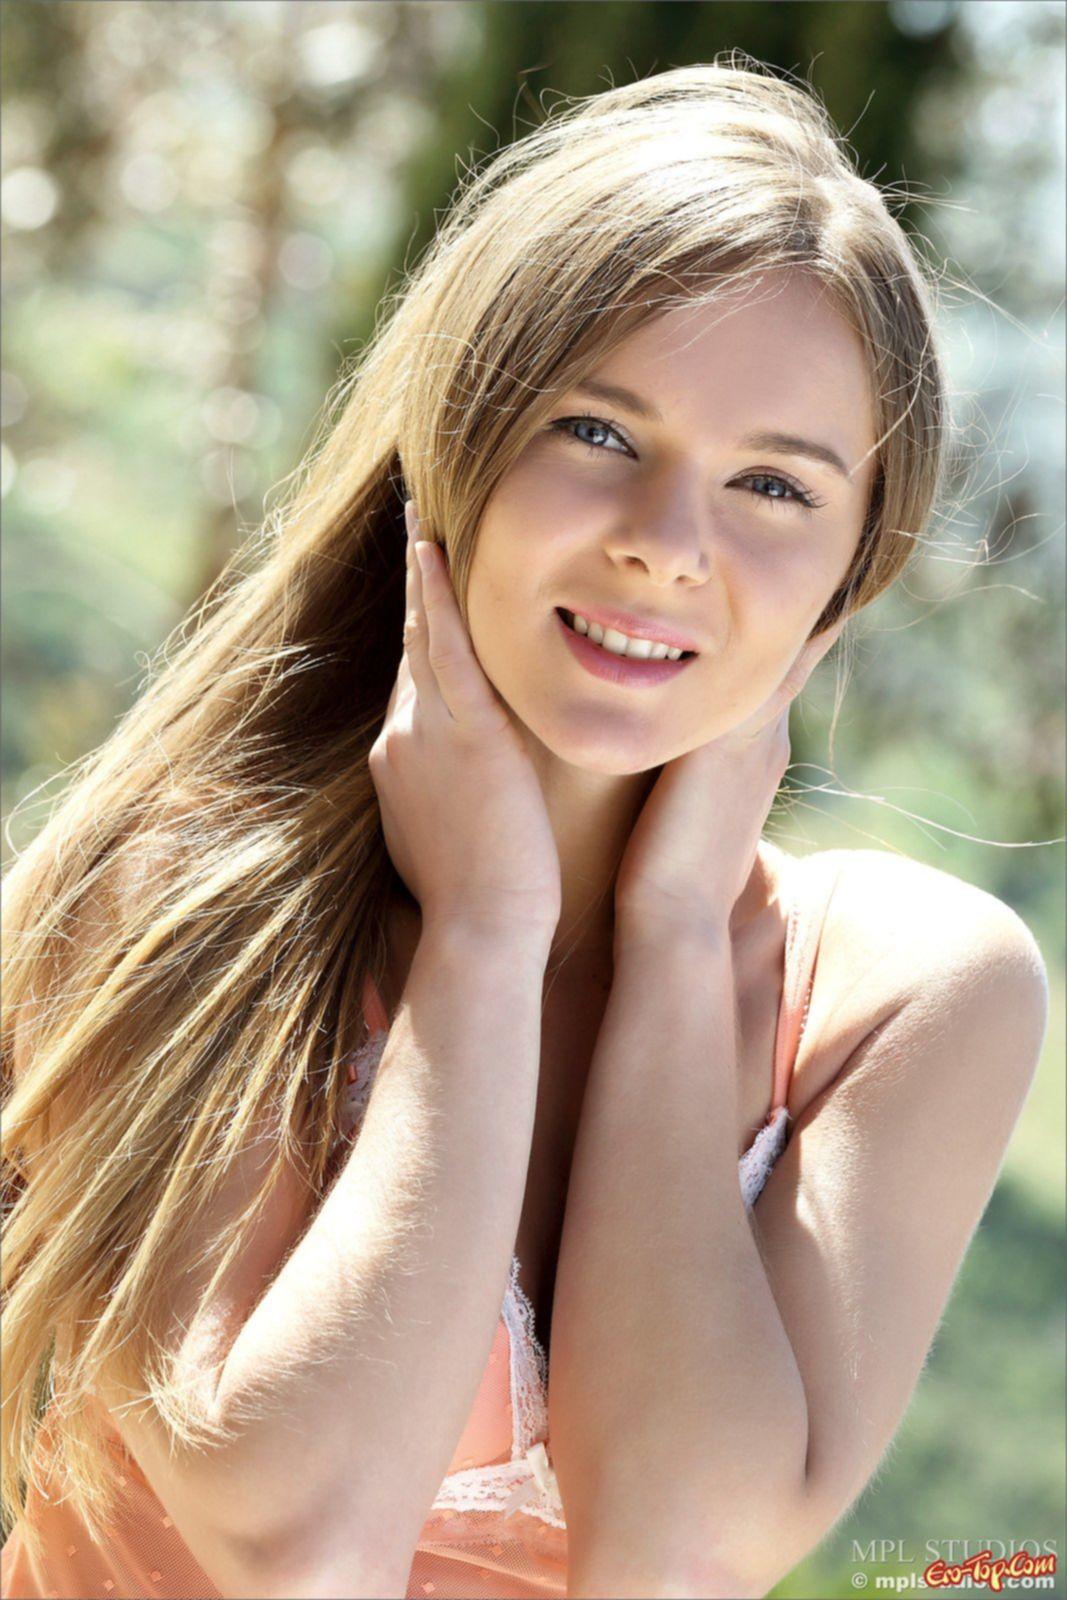 Молодая девушка с красивой киской. Фото эротика Dana P.